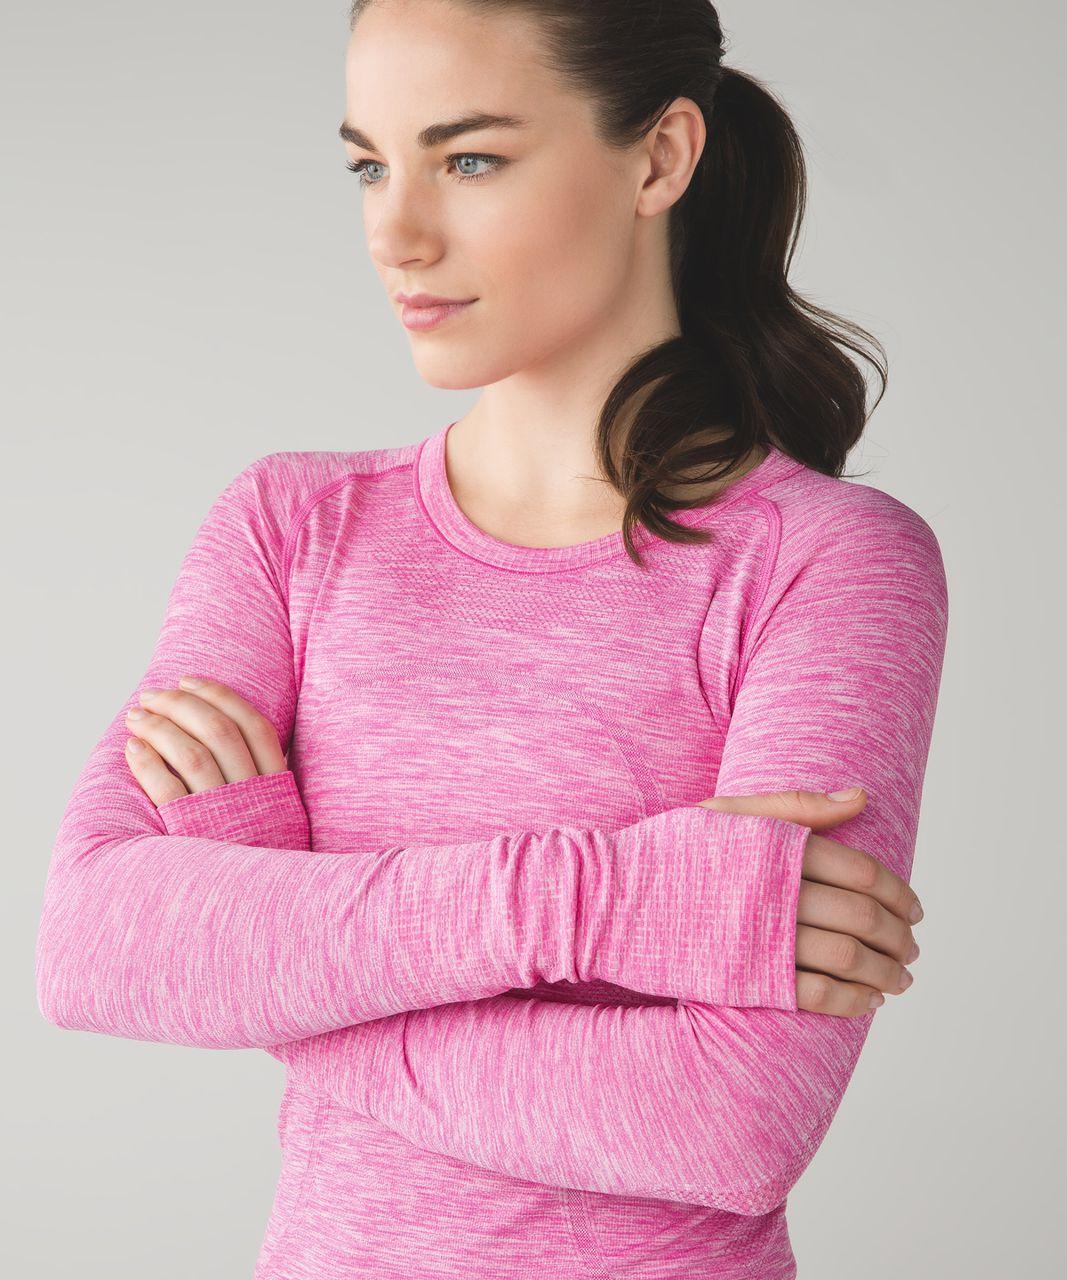 Lululemon Swiftly Tech Long Sleeve Crew - Heathered Pink Paradise